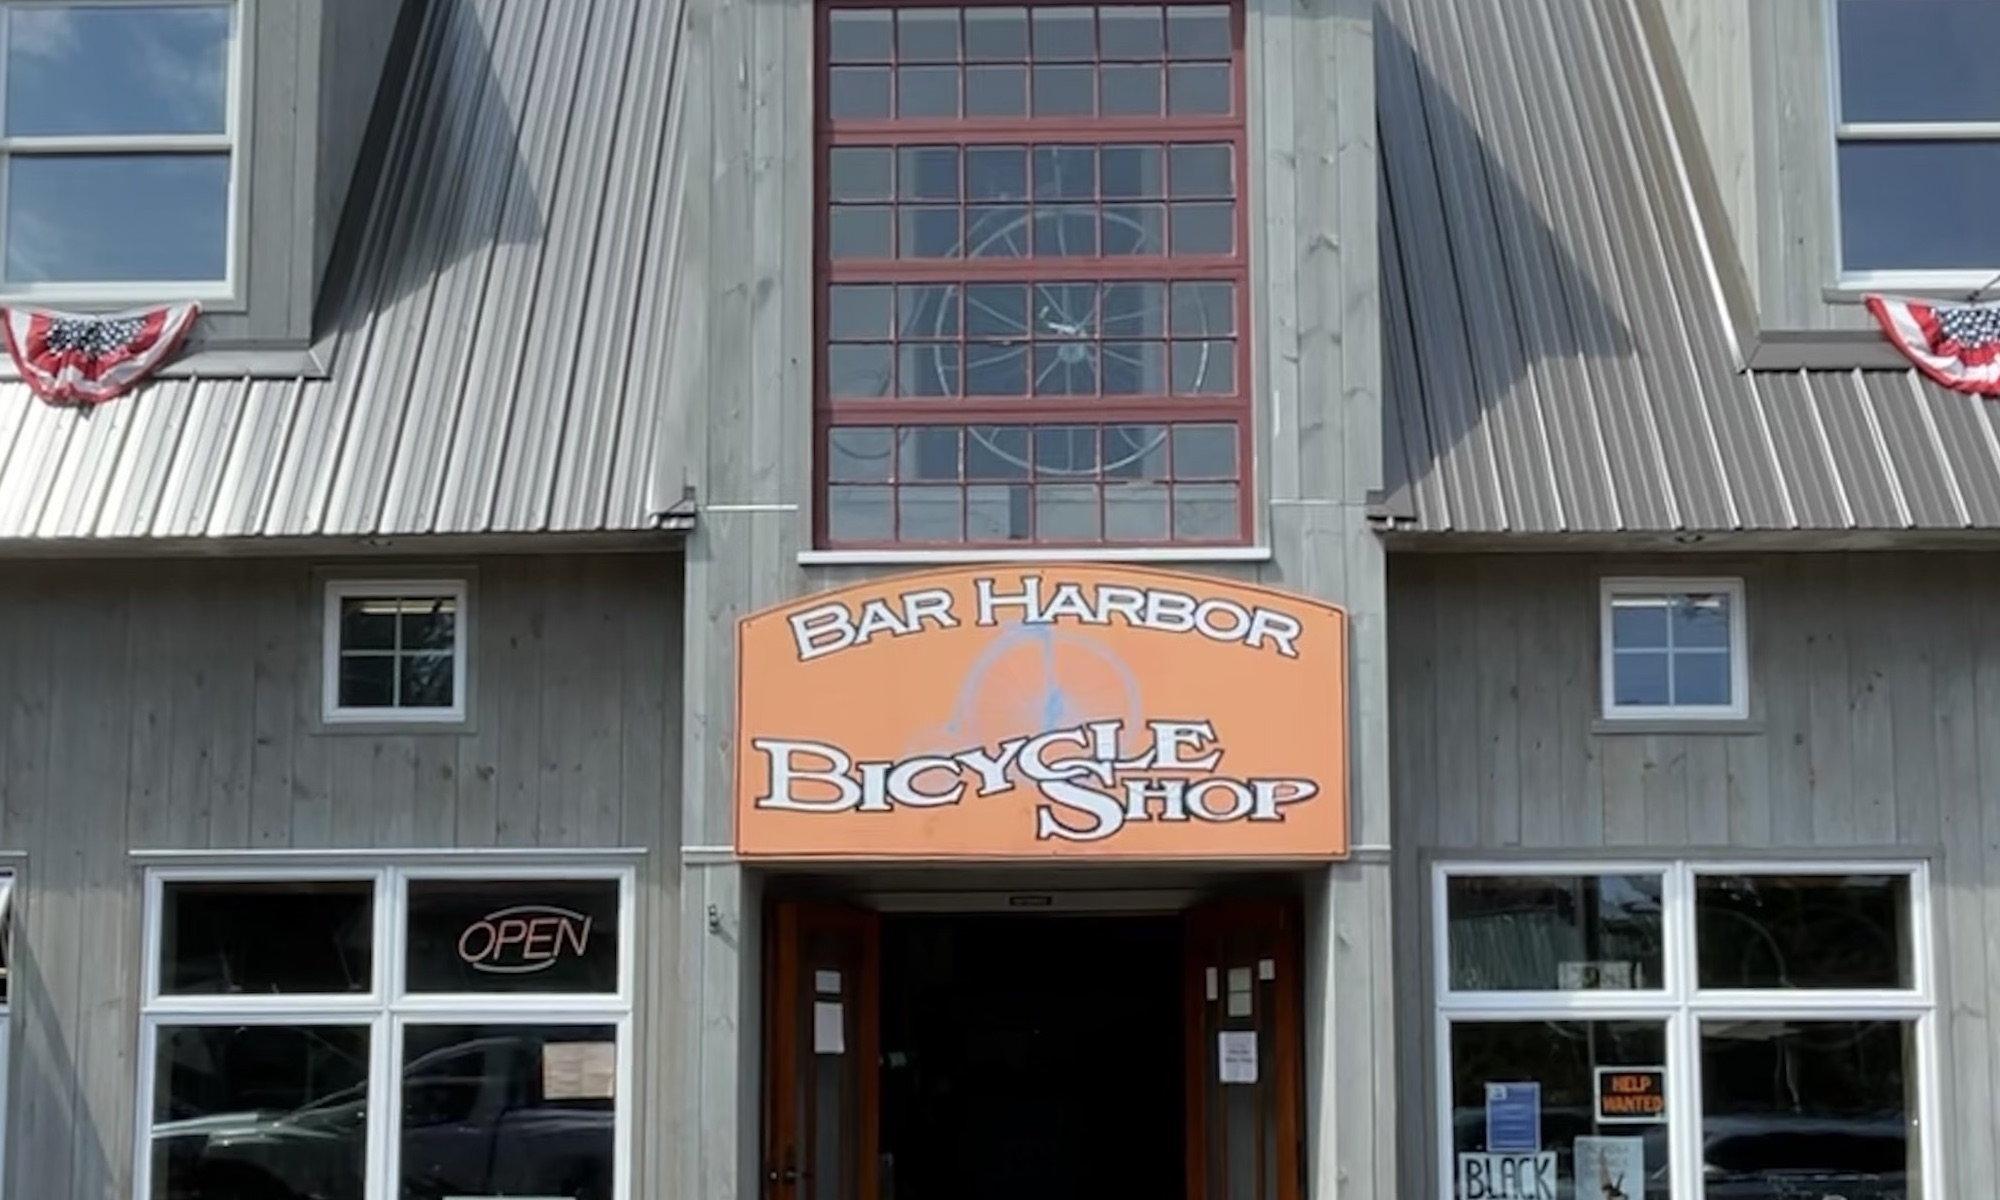 Bar Harbor Bicycle Shop